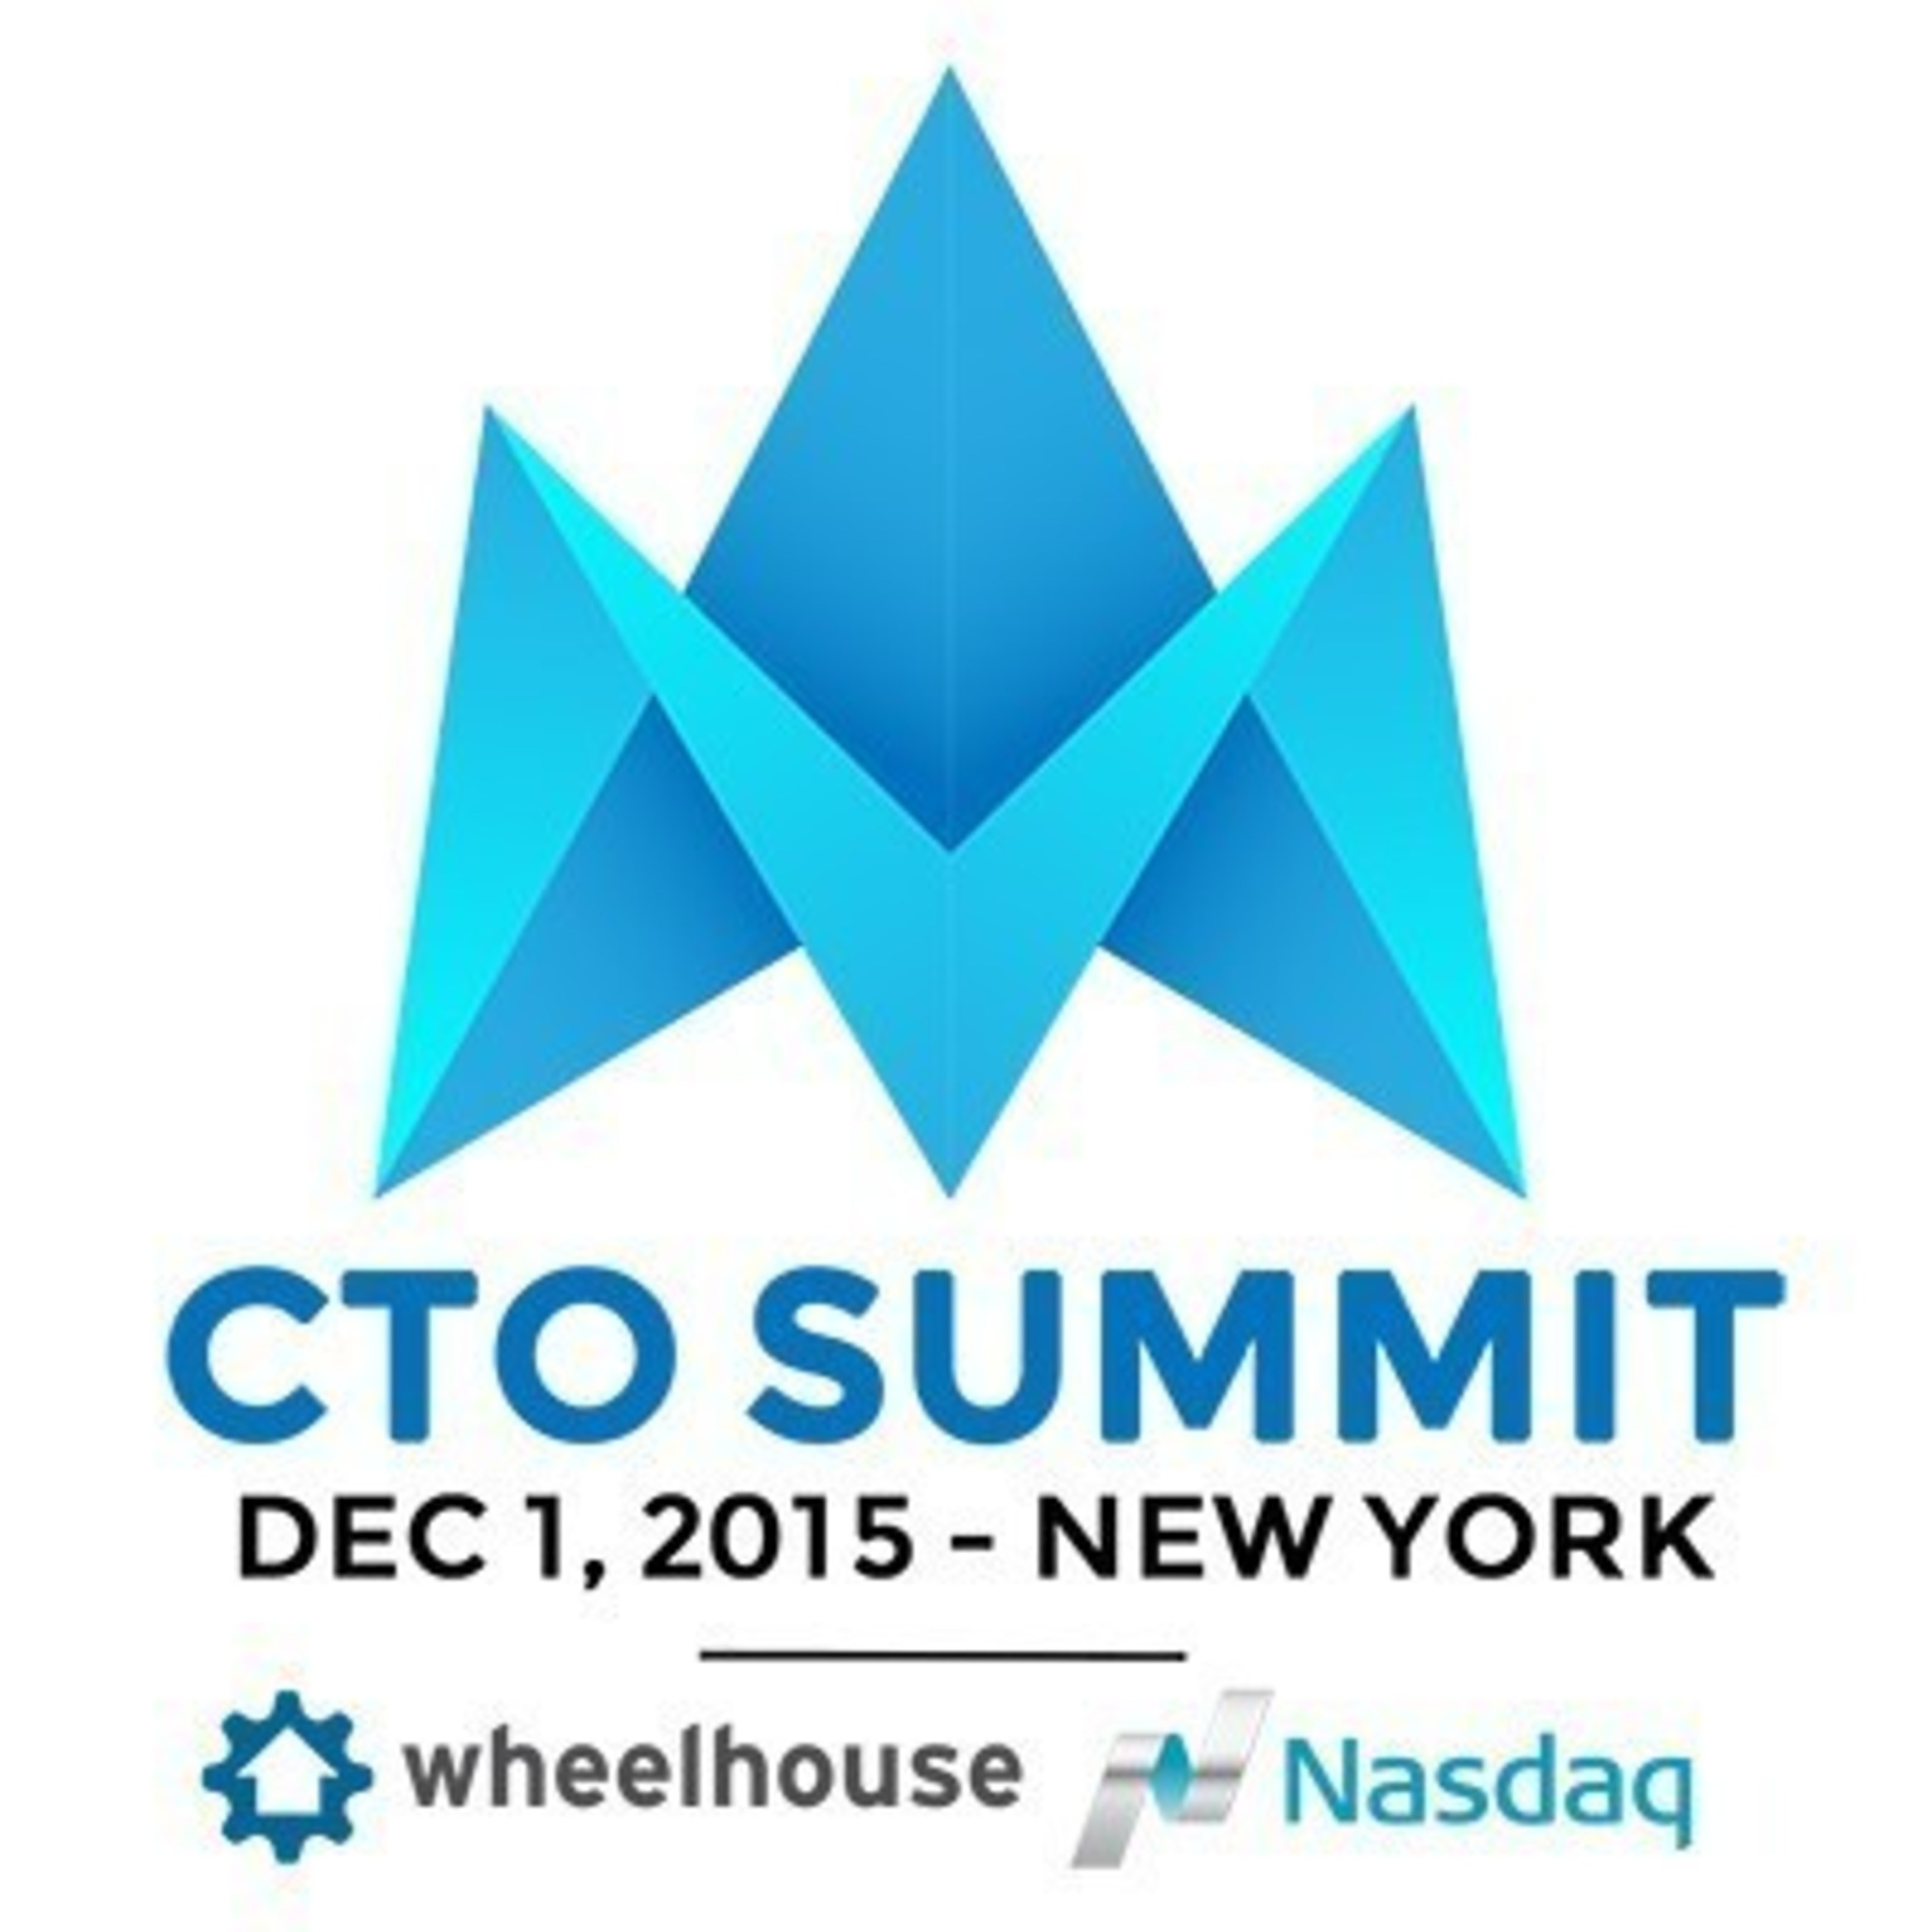 Wheelhouse to Kick Off CTO Summit Series at the Nasdaq MarketSite on Dec 1, 2015 in New York City